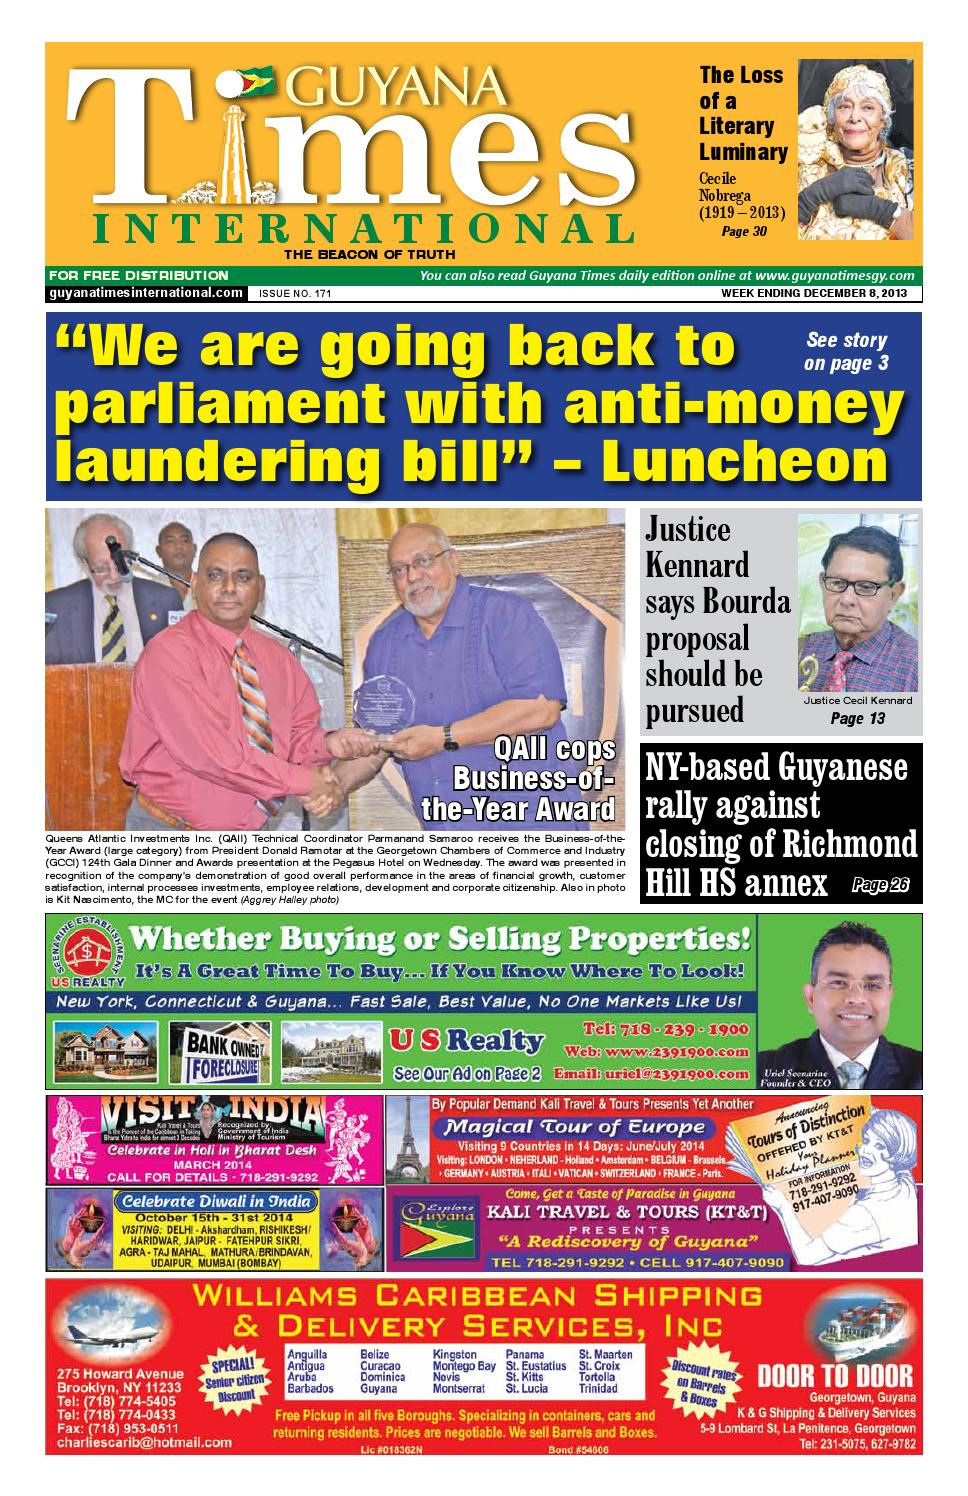 88d8442eb Guyana Times International by Gytimes - issuu